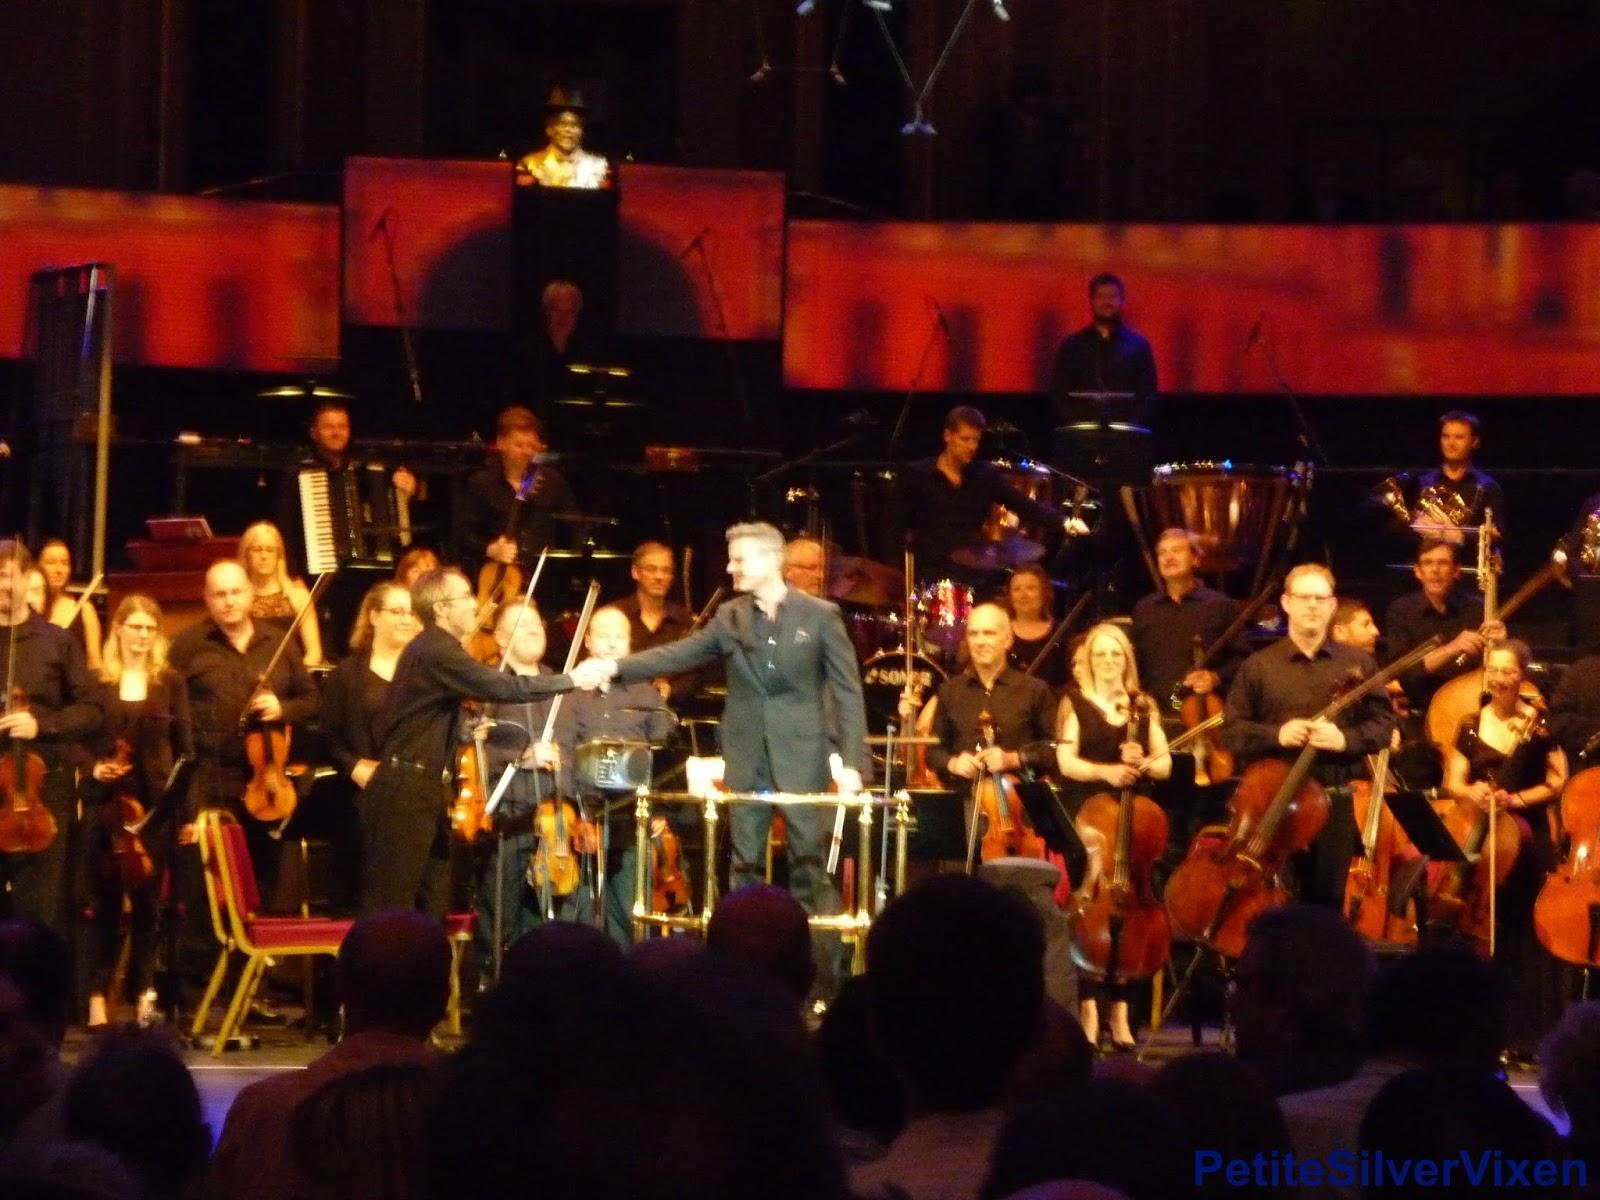 BBC Concert Orchestra | PetiteSilverVixen